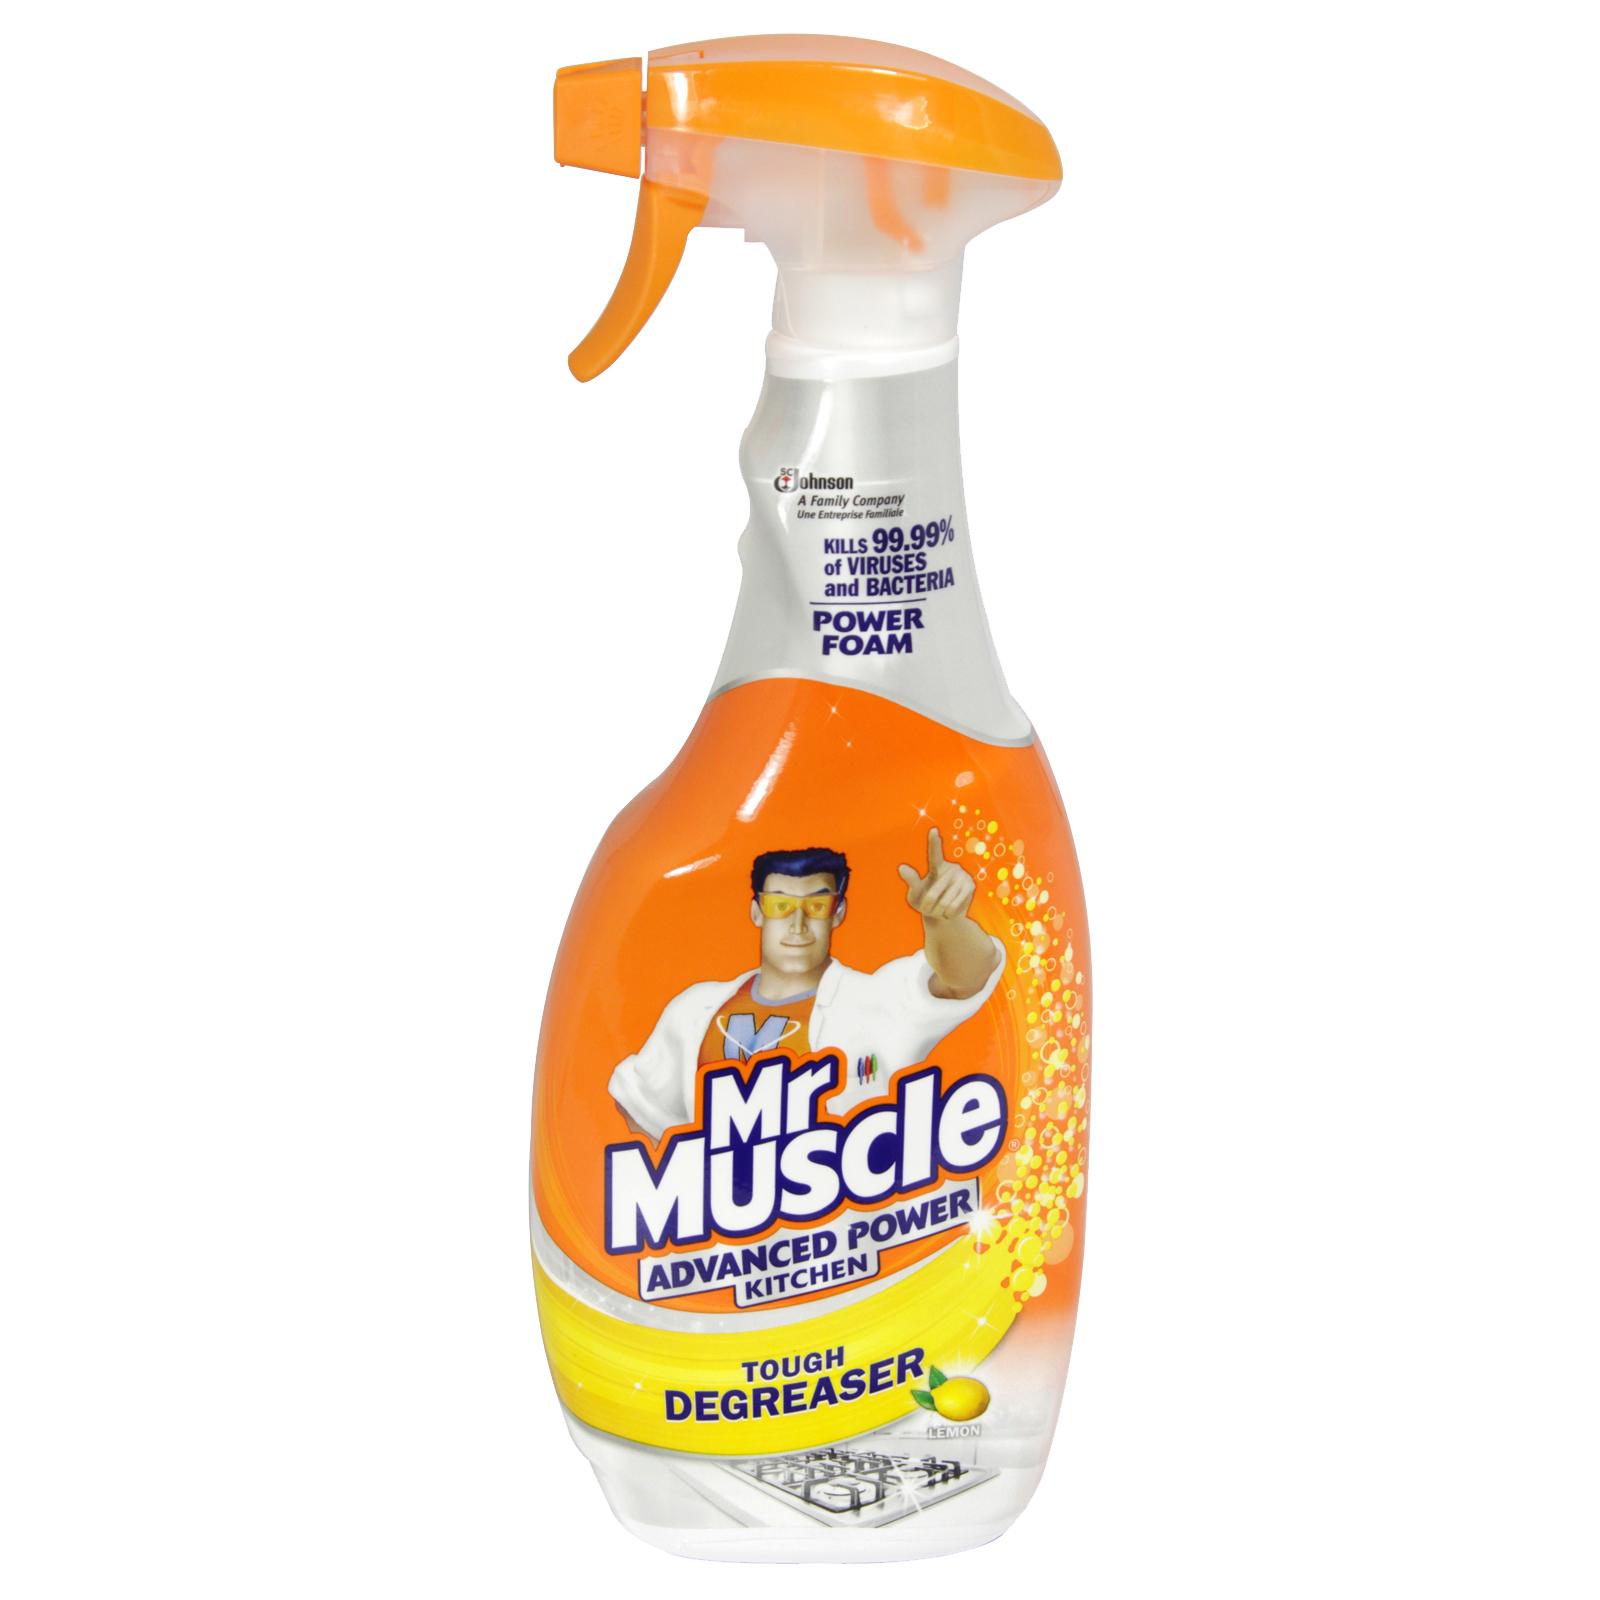 MR MUSCLE 750ML SPRAY ADVANCED KITCHEN POWER TOUGH DEGREASER X6